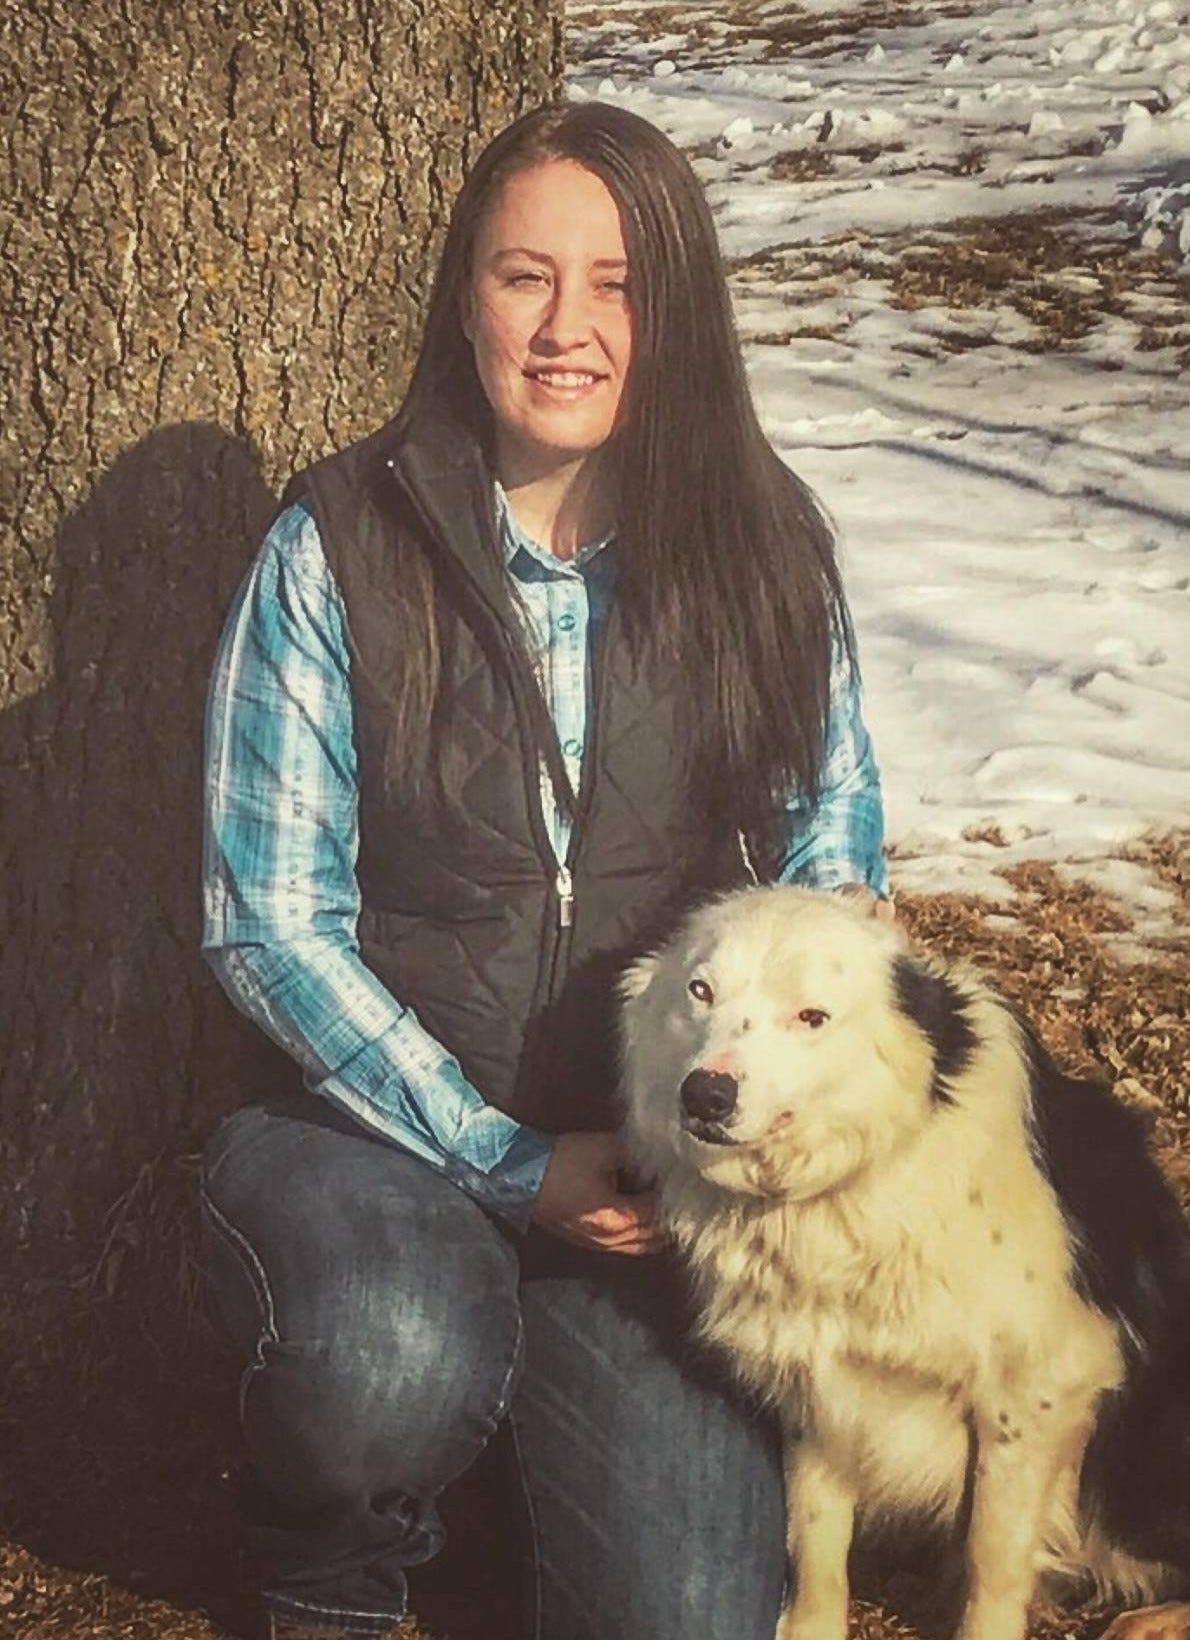 Brooke Ollerich, 21 | Argus Leader